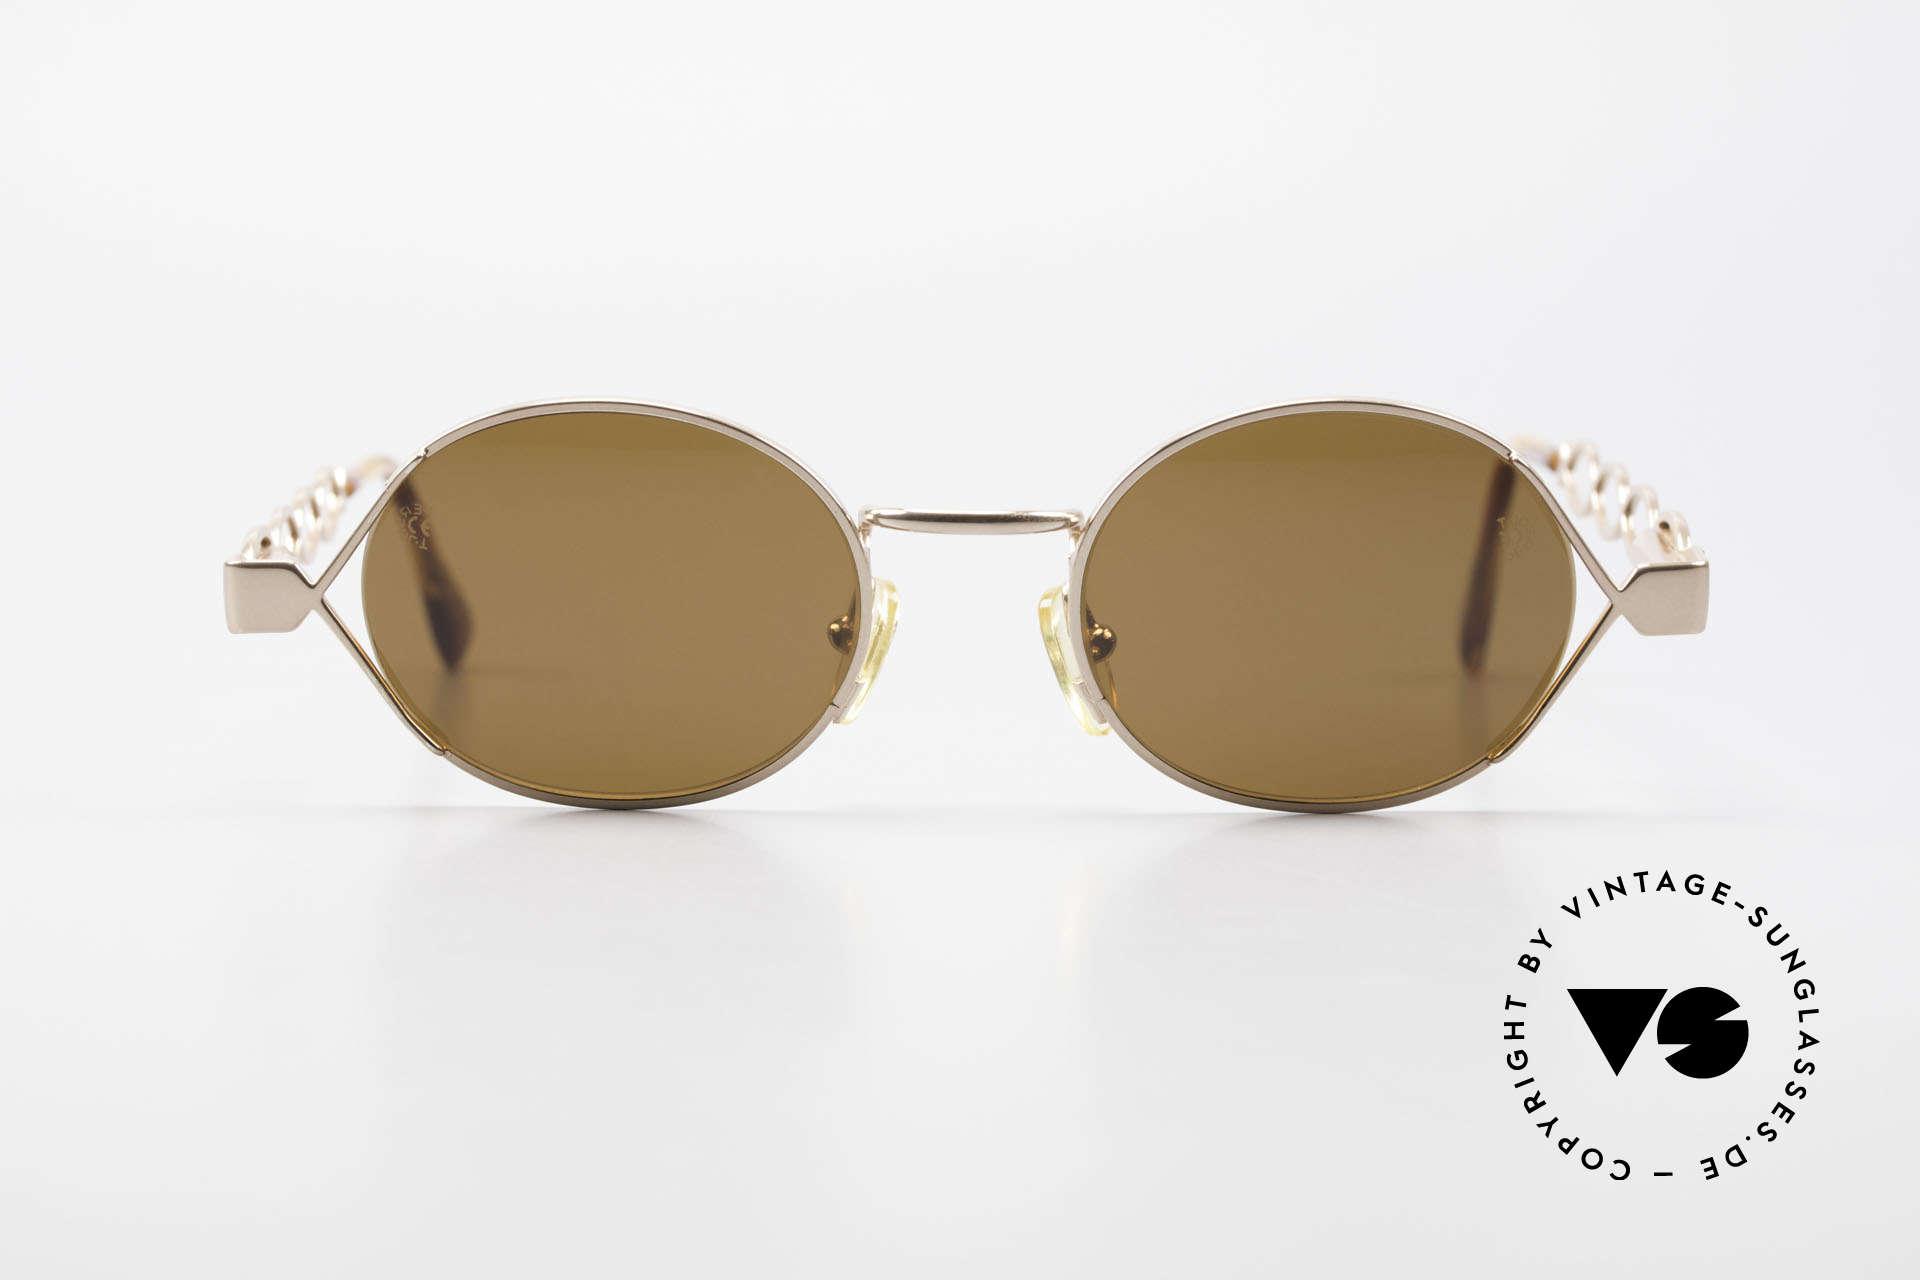 Moschino MM344 Ladies Designer Sunglasses 90s, creative interpretation of the classic round design, Made for Women